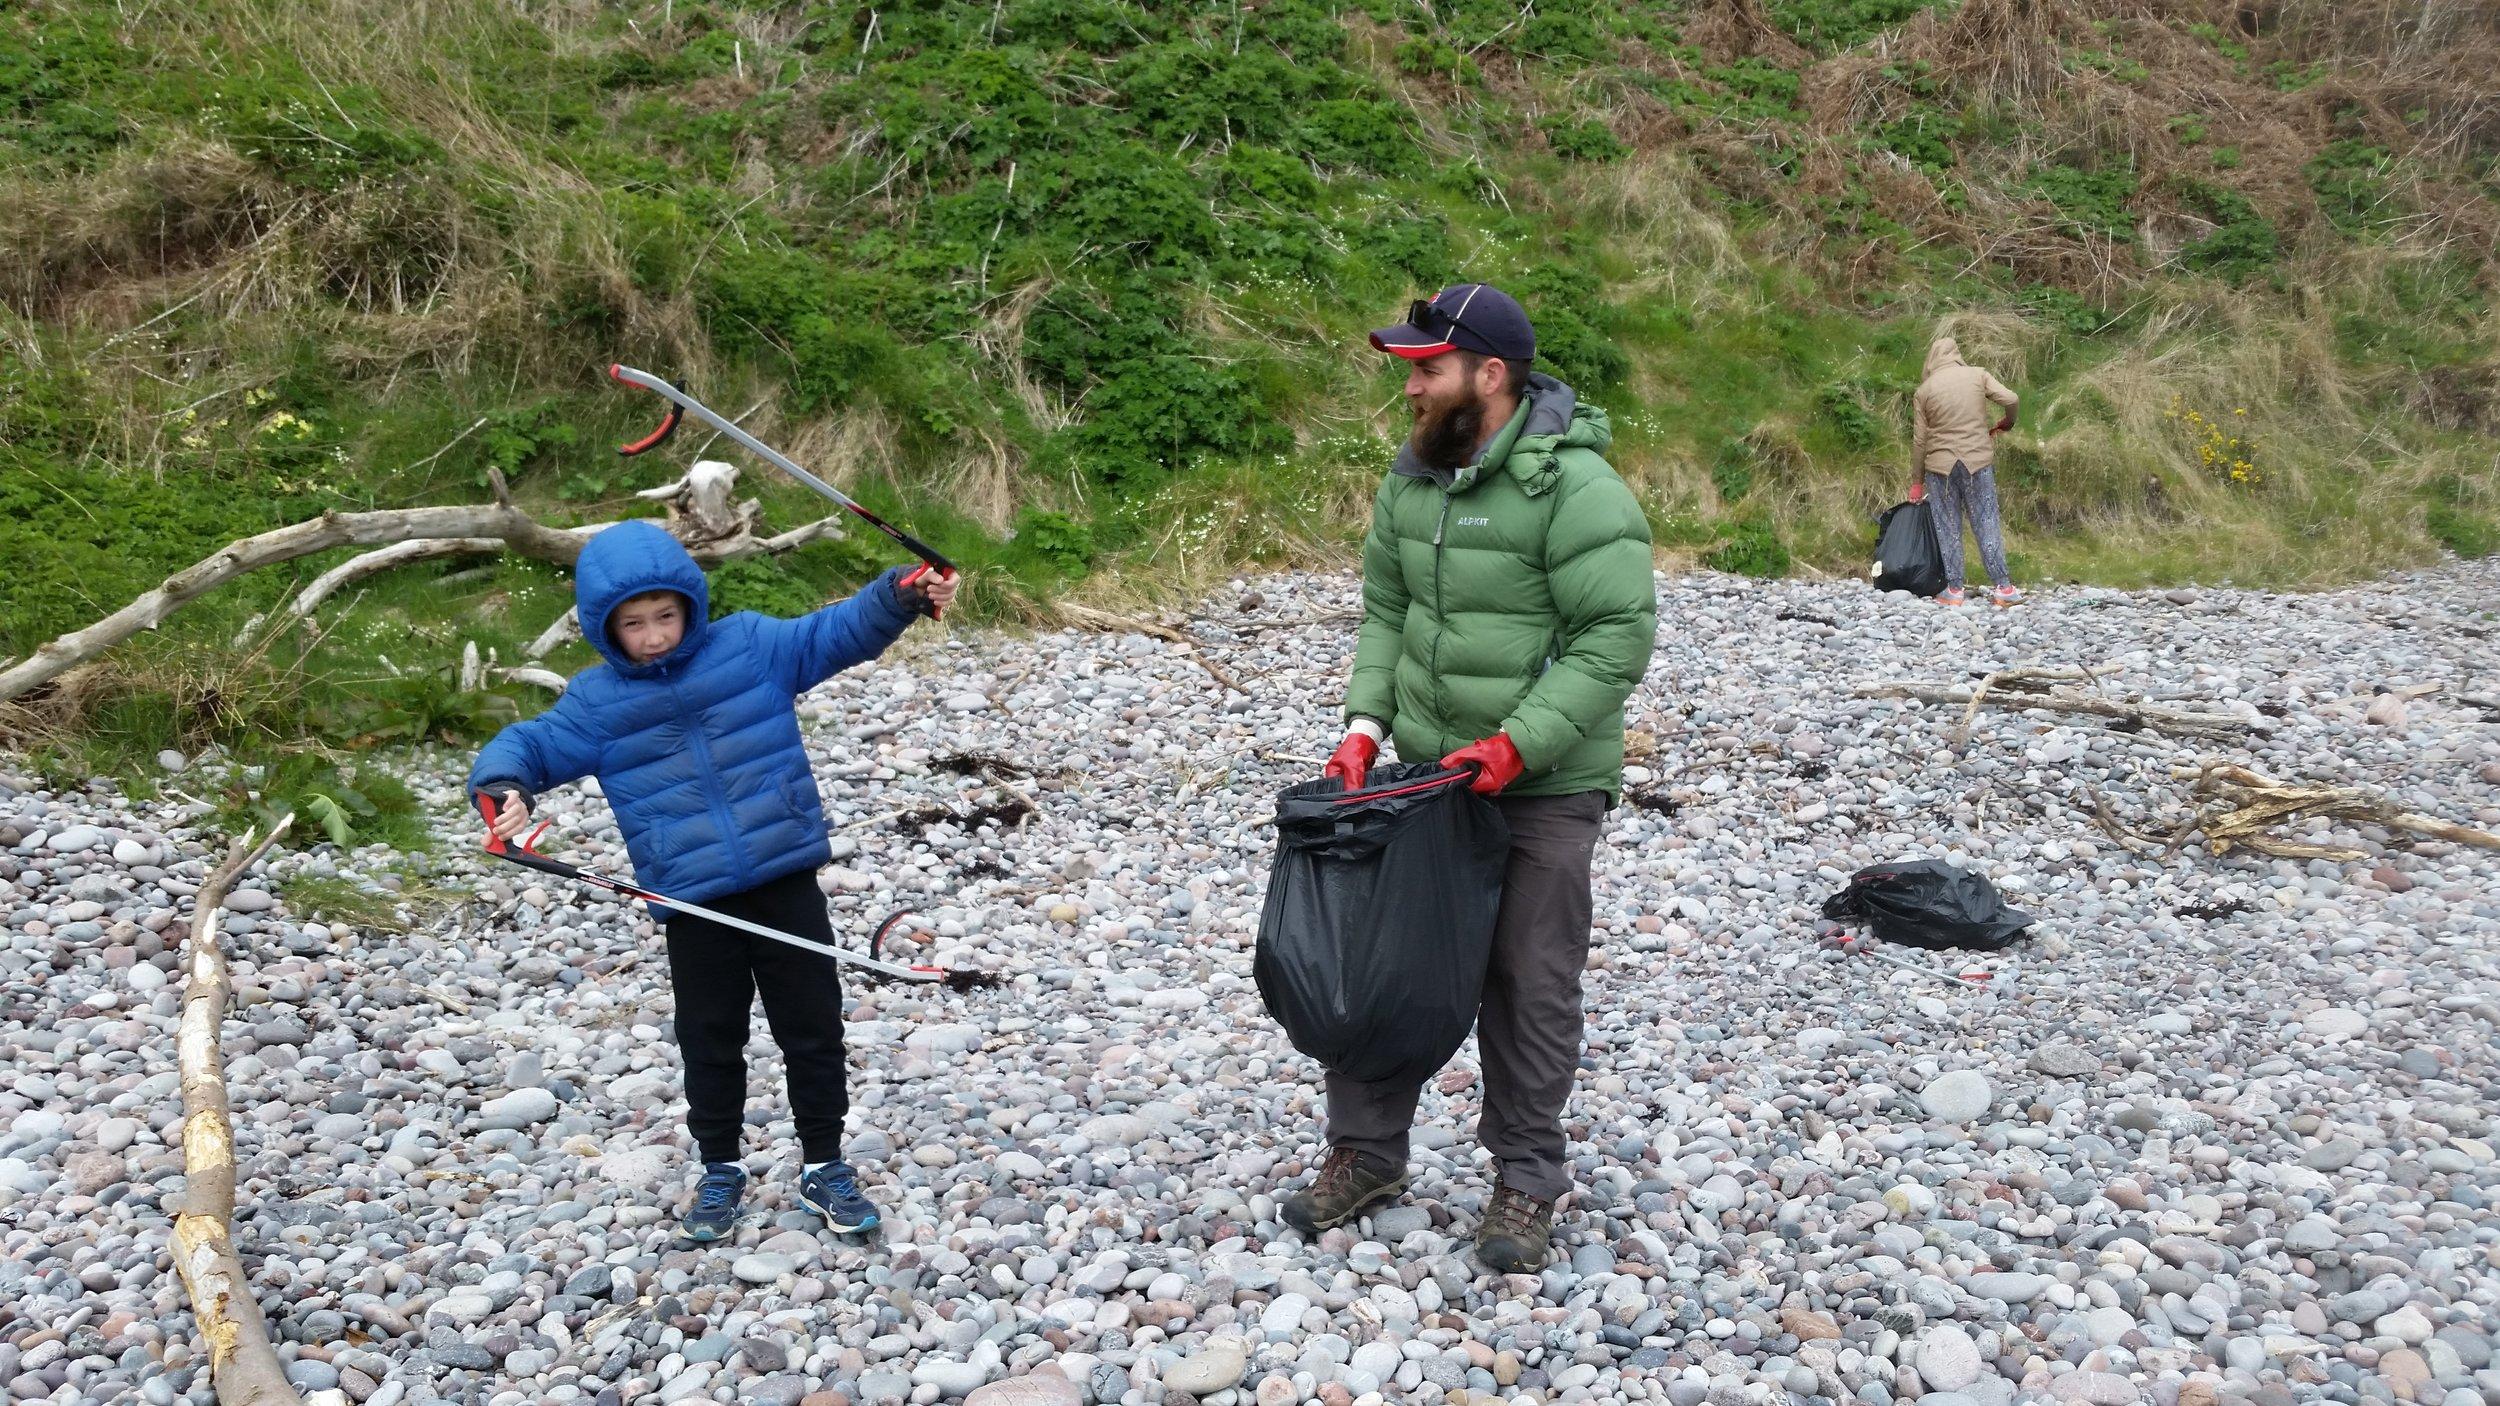 Daniel, the beach cleaning Ninja